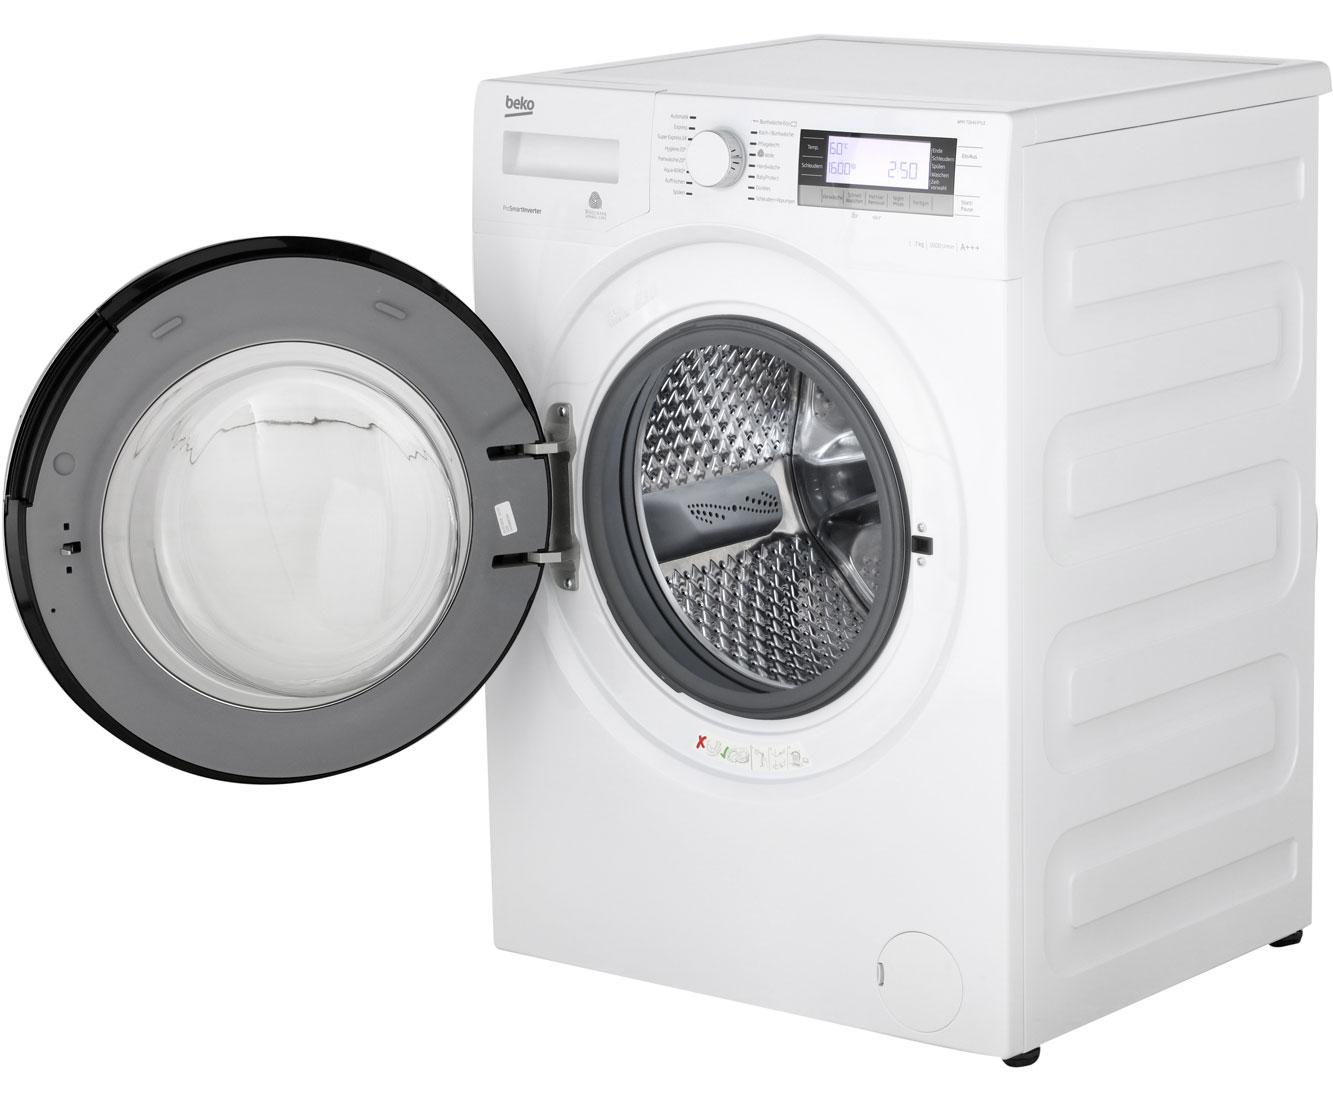 beko wmy 71643 ptle green line serie waschmaschine freistehend wei neu ebay